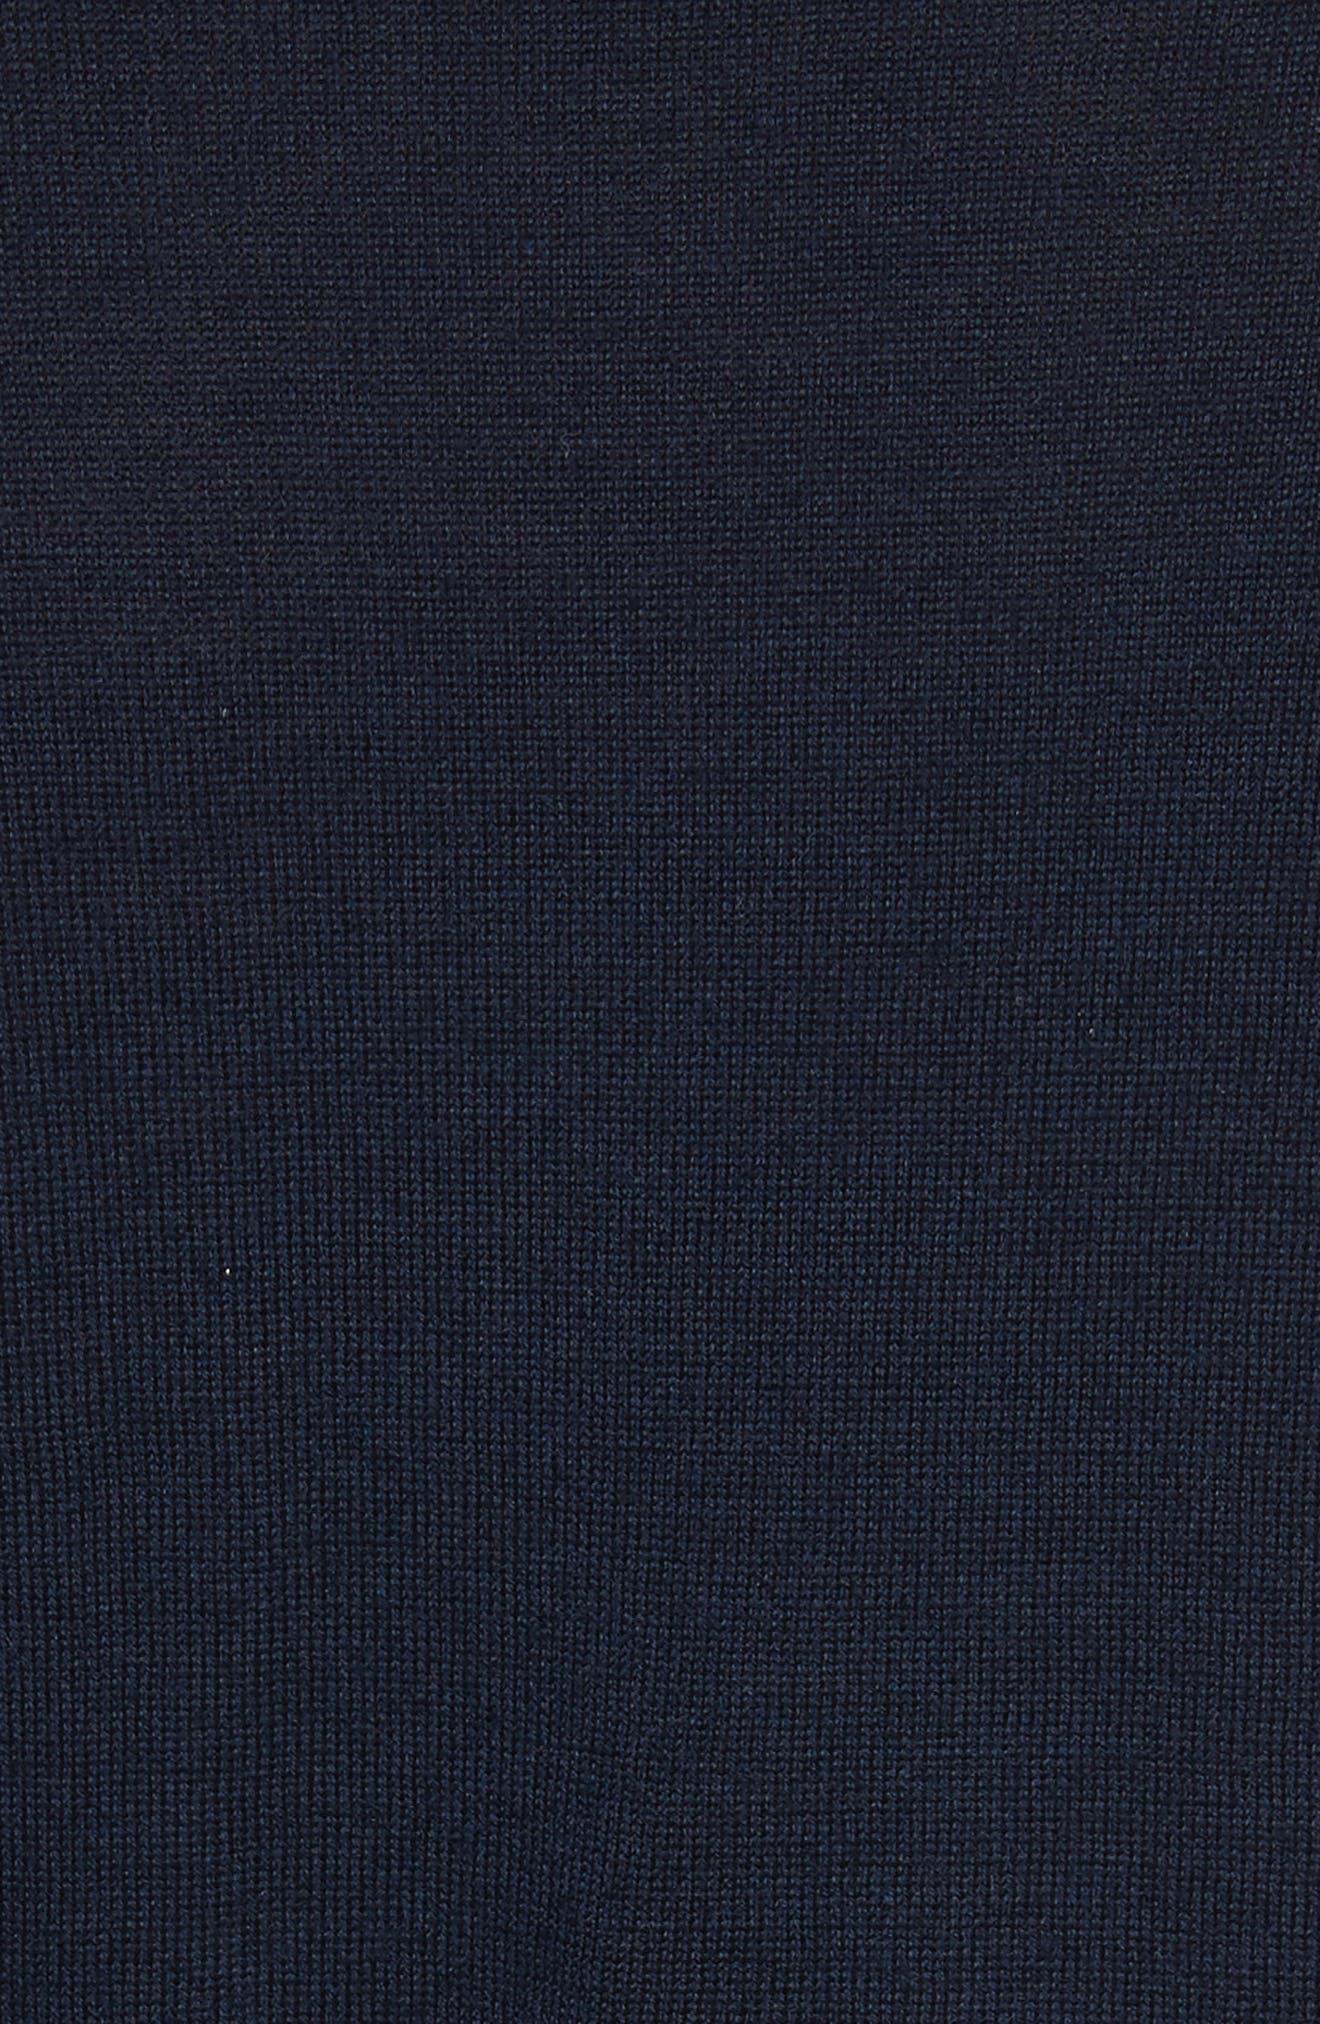 Roscoe Mixed Media Sweater,                             Alternate thumbnail 5, color,                             410